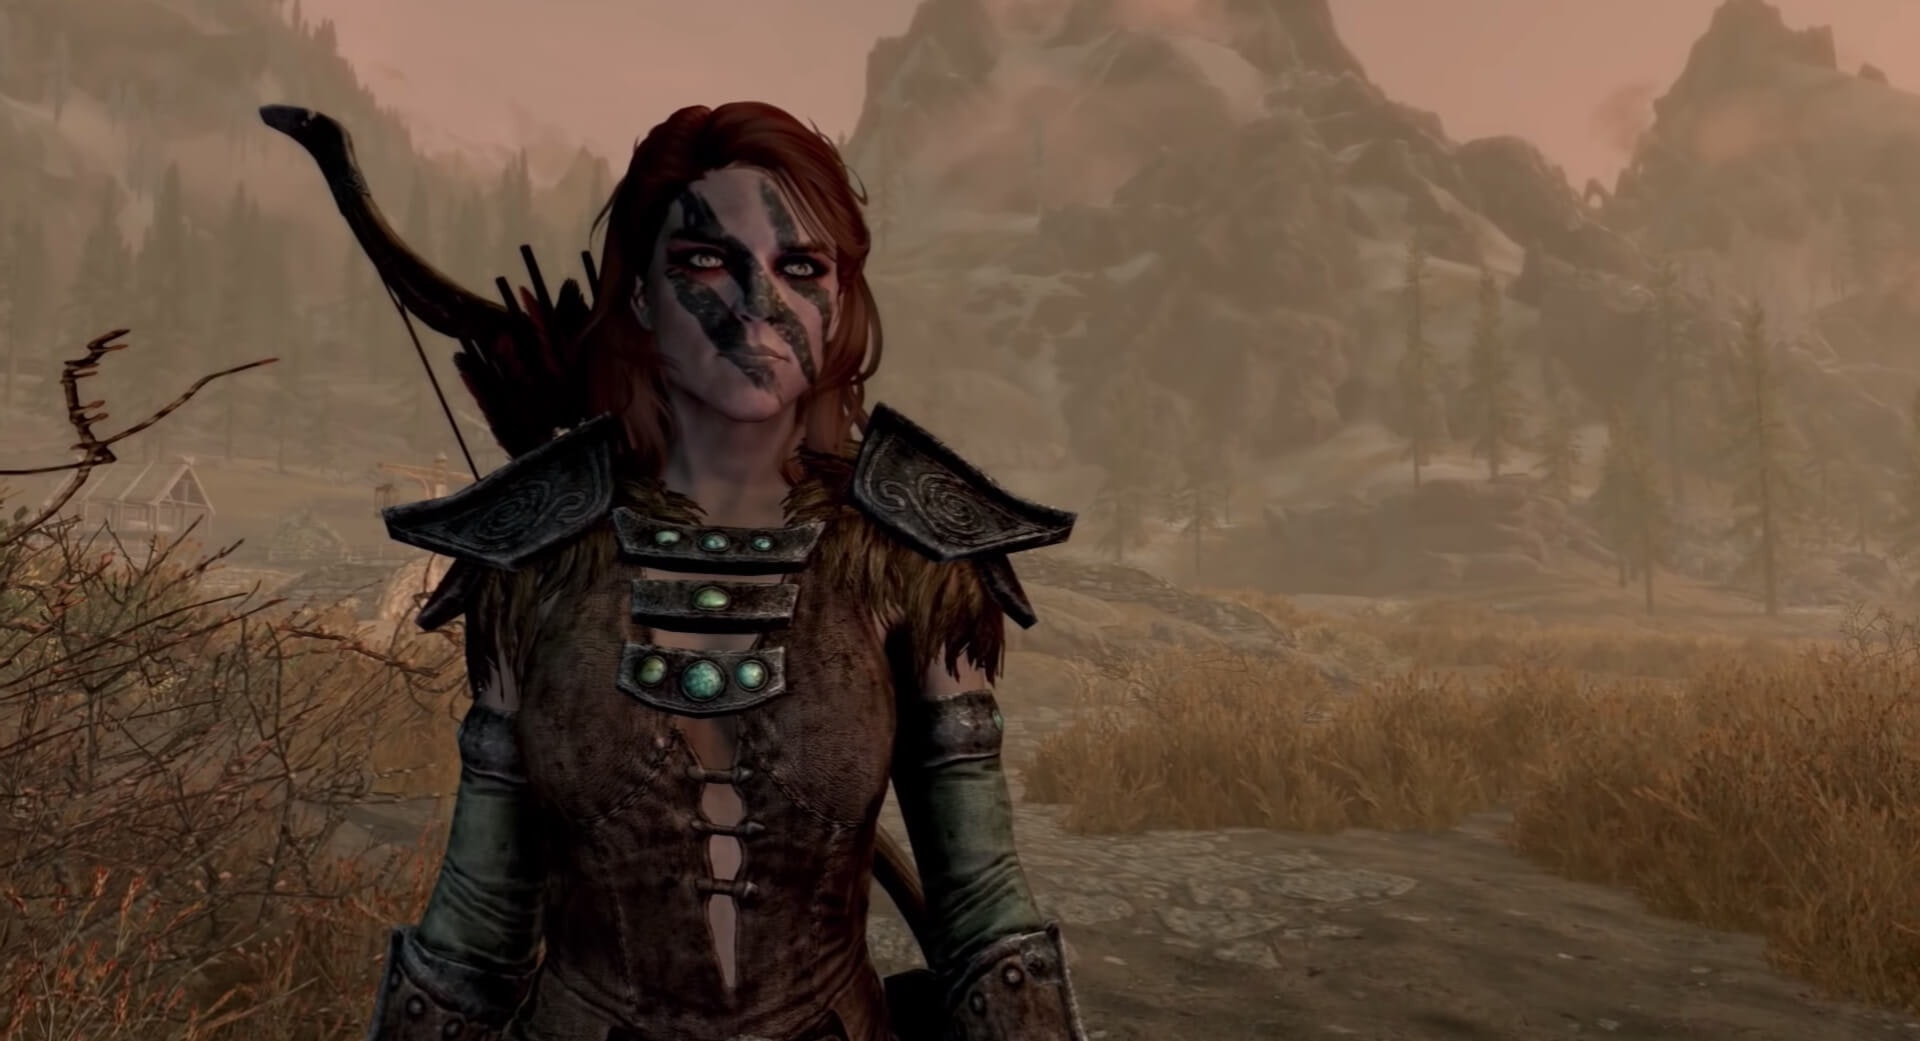 Aela the Huntress skyrim followers